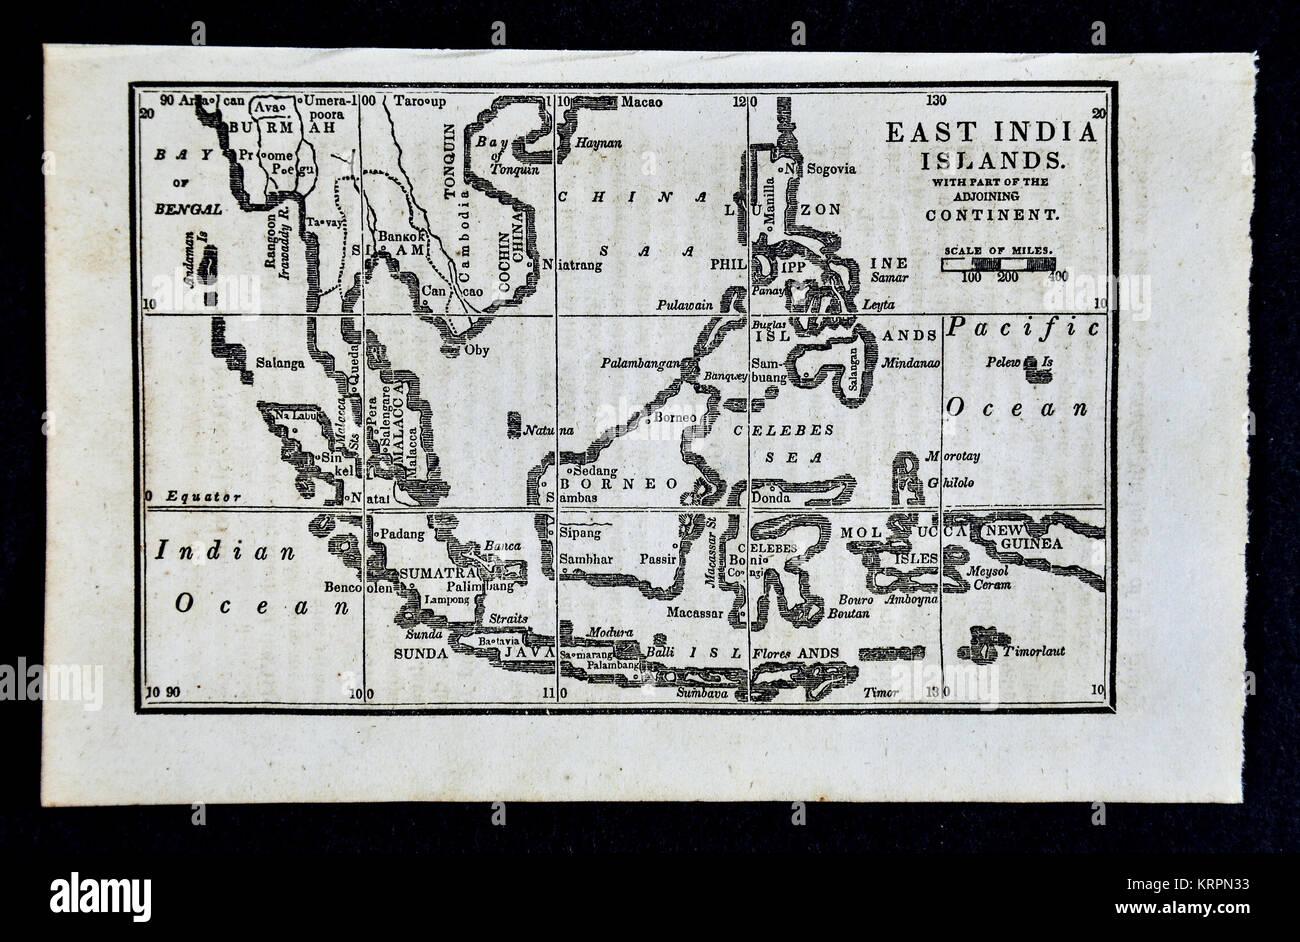 Singapore Map Vintage Stockfotos & Singapore Map Vintage Bilder - Alamy